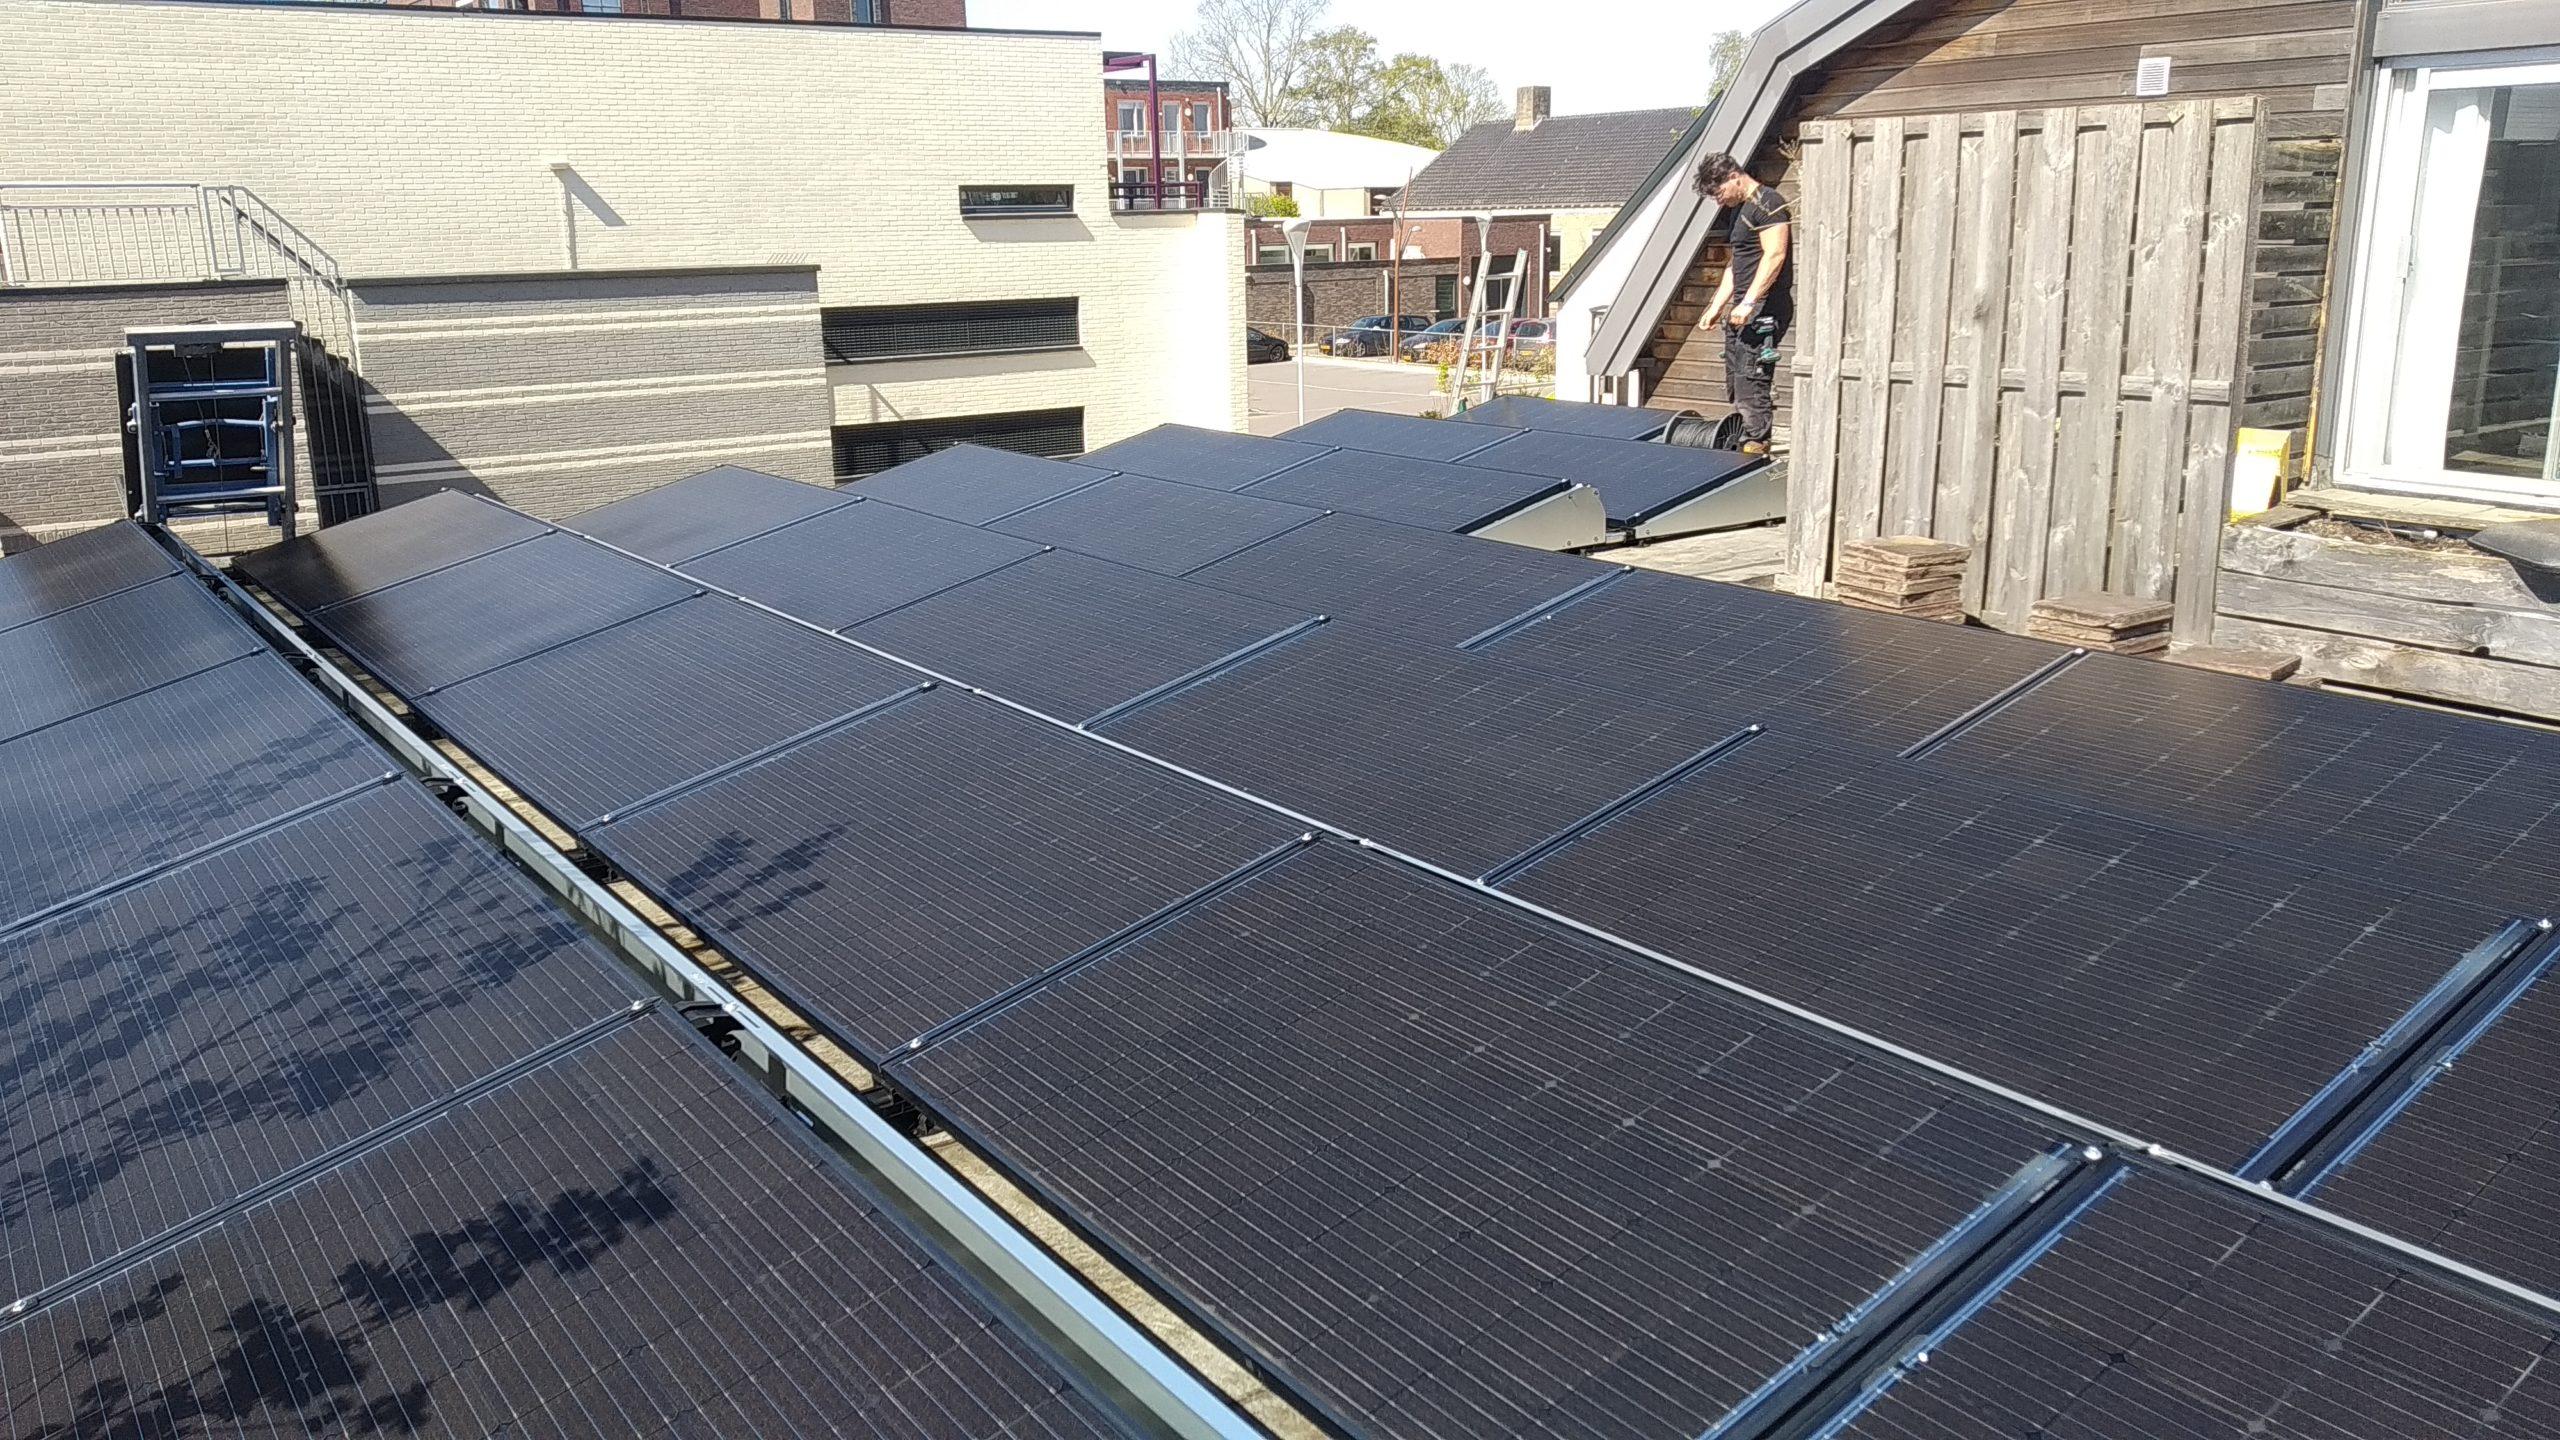 SolarWatt glas-glas zwarte zonnepanelen met SMA Tripower Dedemsvaart